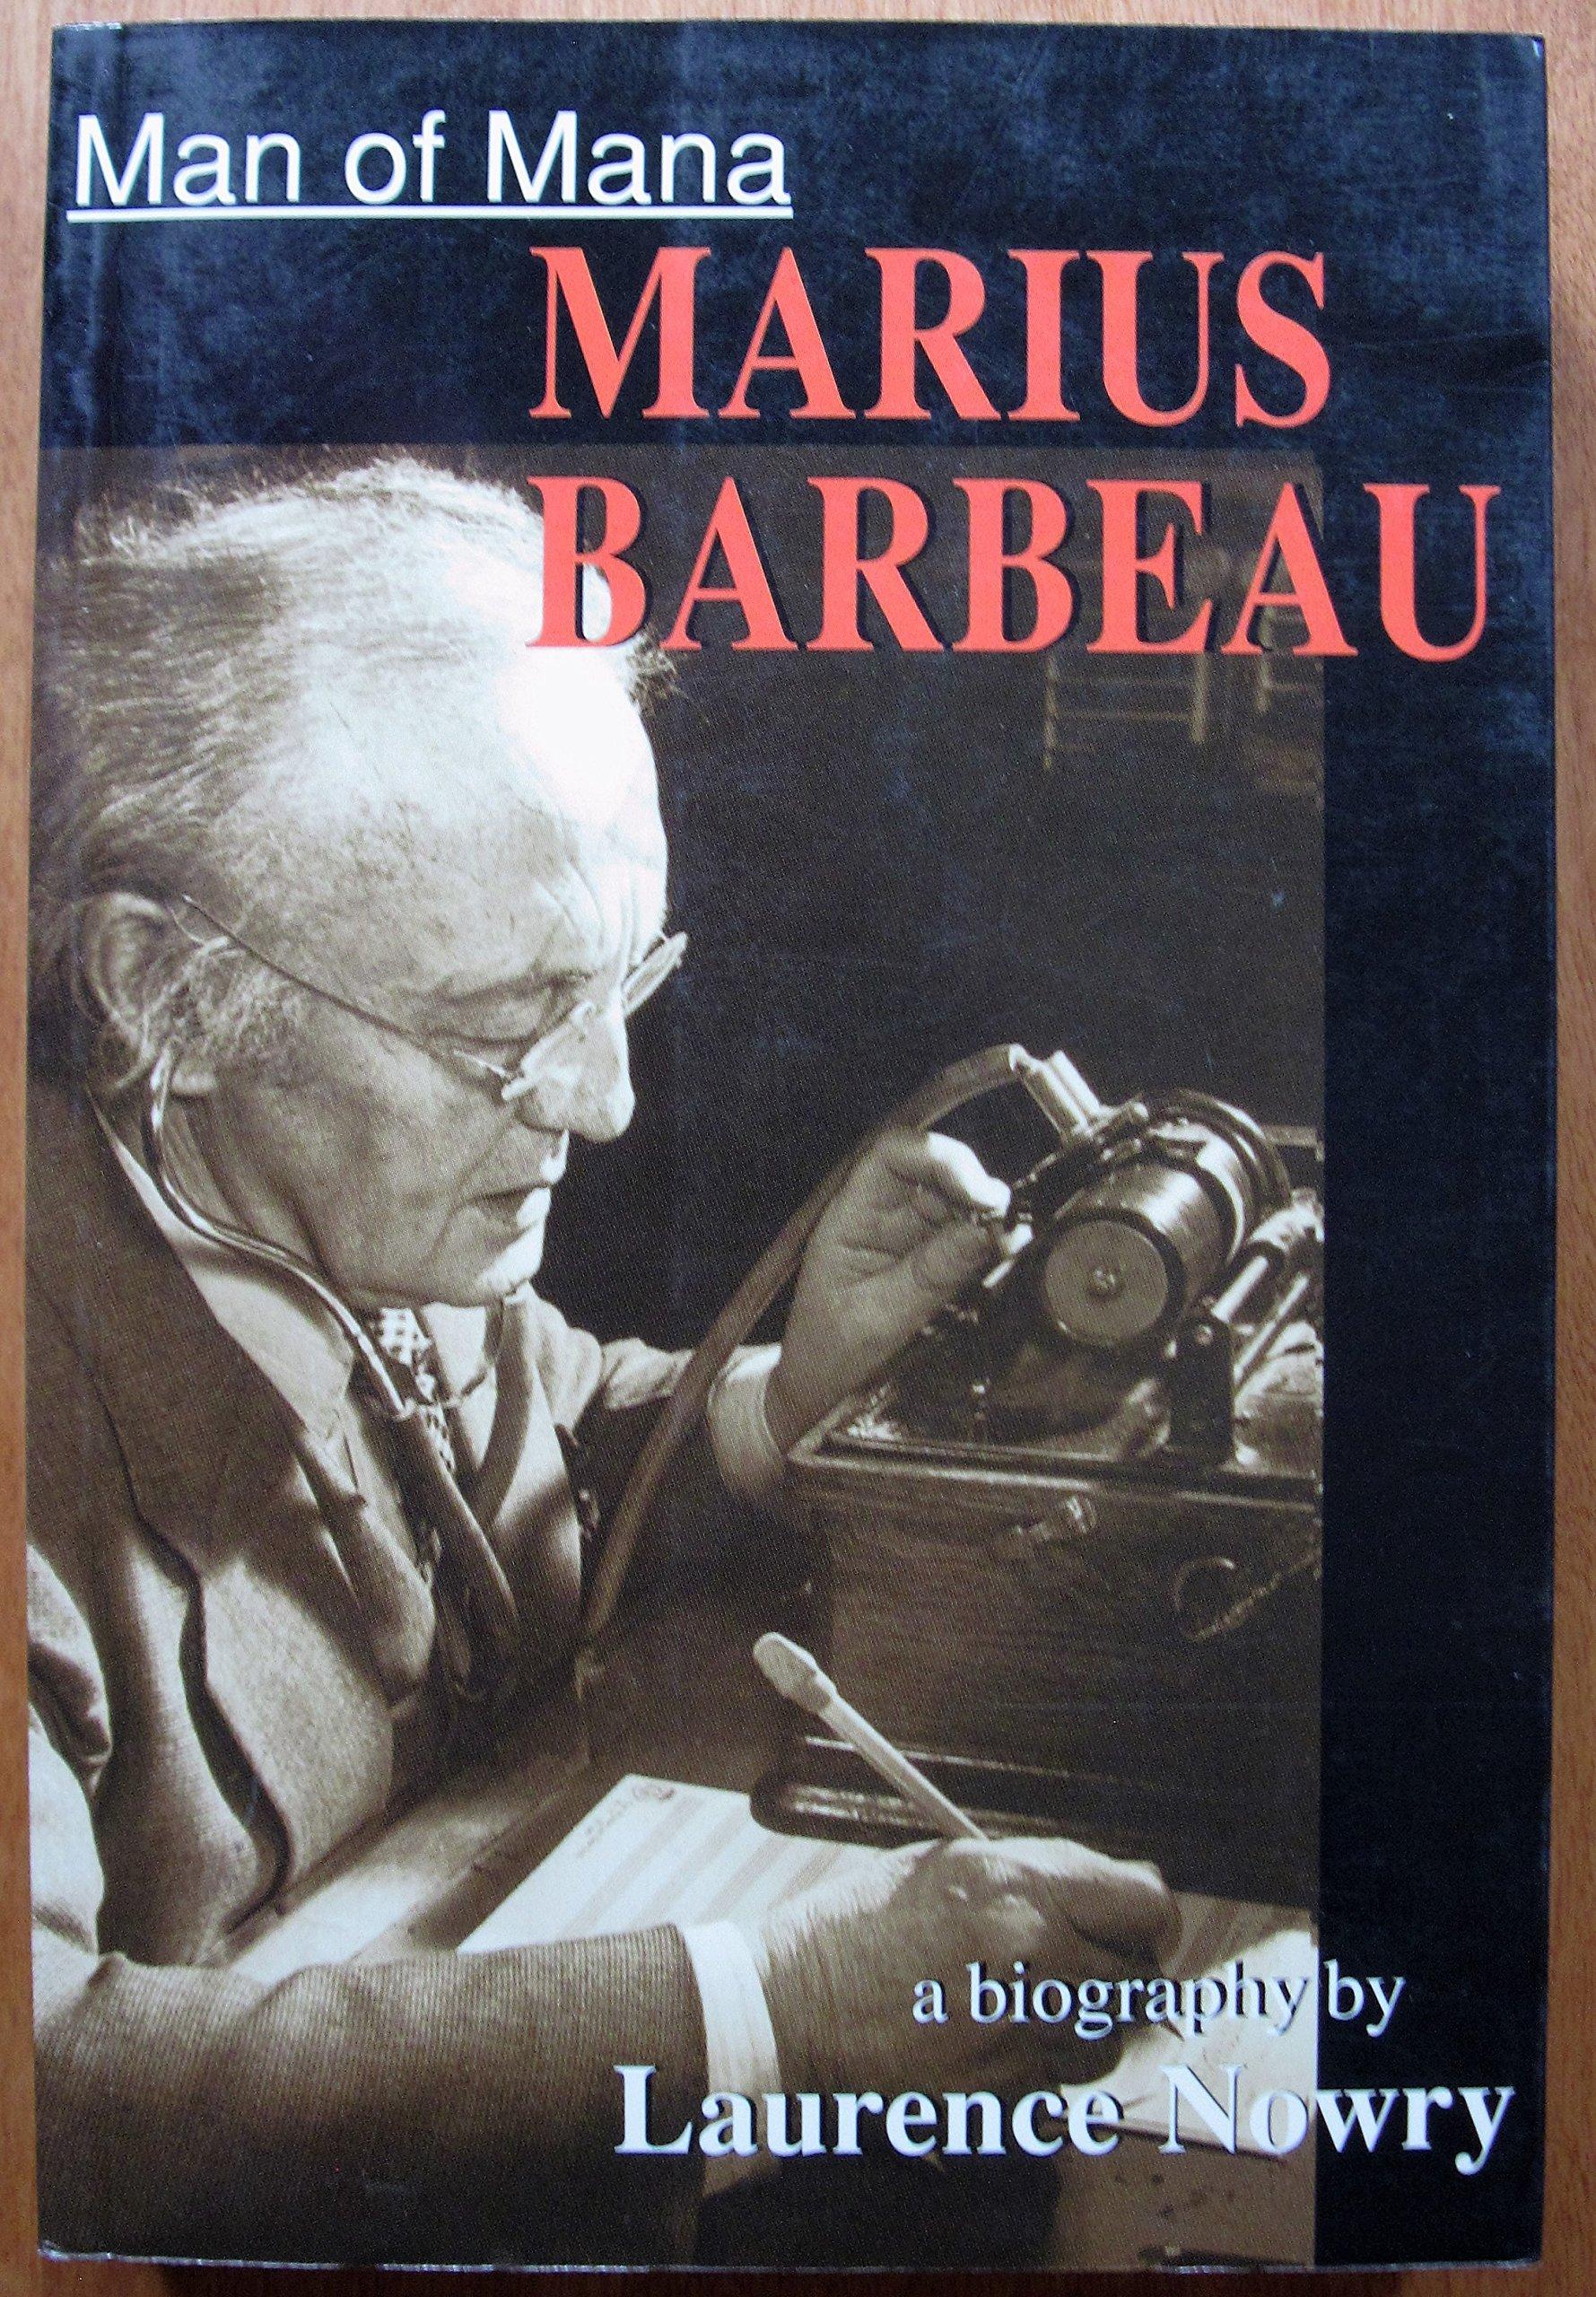 Man of Mana: Marius Barbeau a Biography